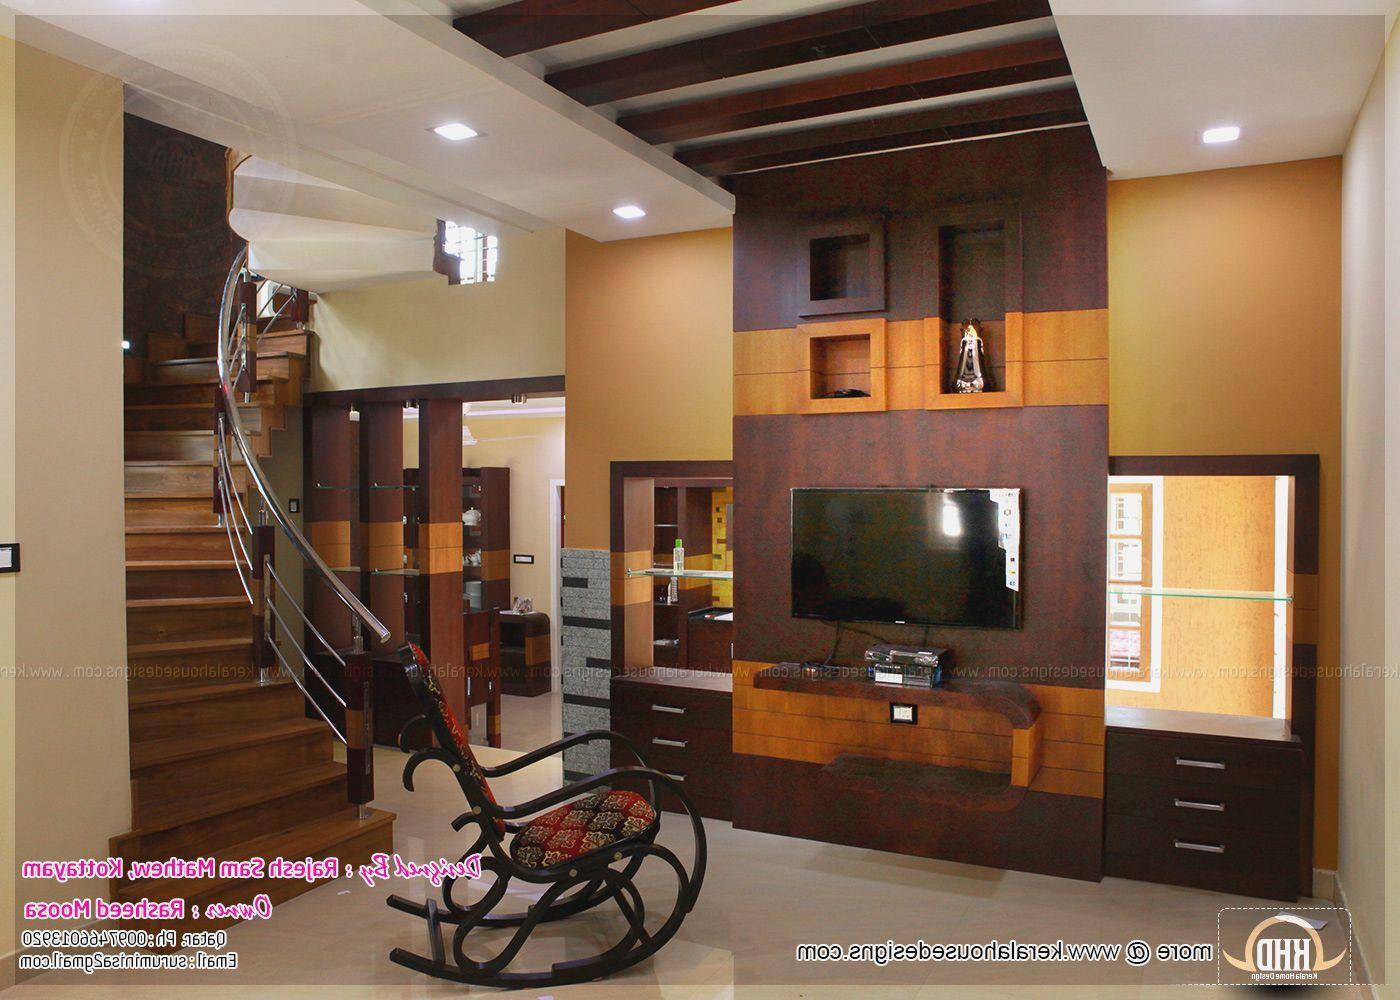 Indian Home Interior Design Photos Middle Class Google Search